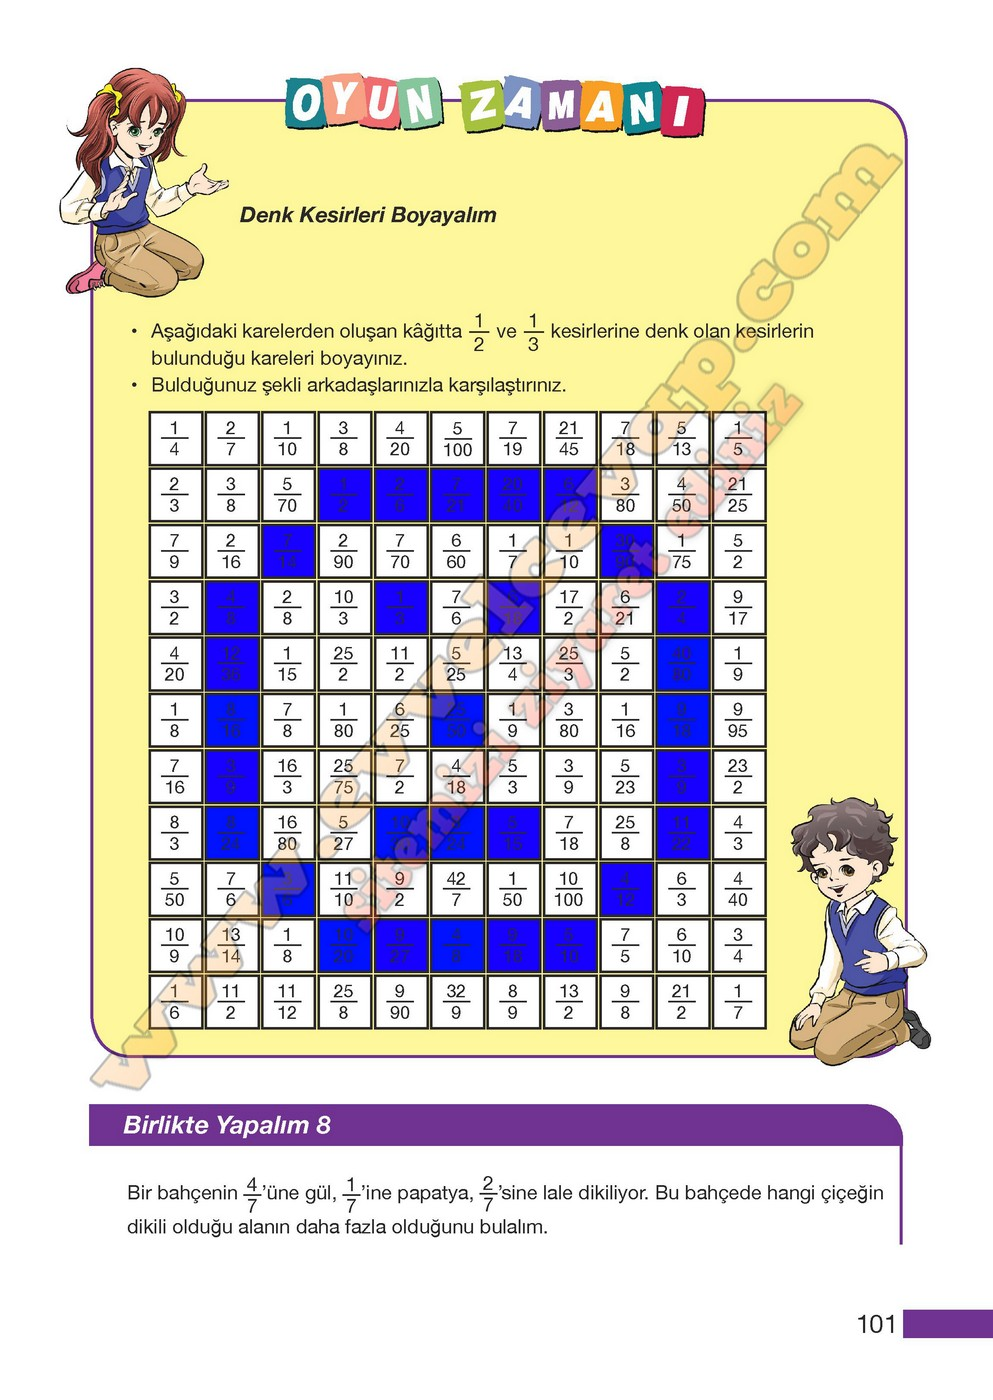 5 Sinif Meb Yayinlari Matematik Ders Kitabi Sayfa 101 Cevaplari